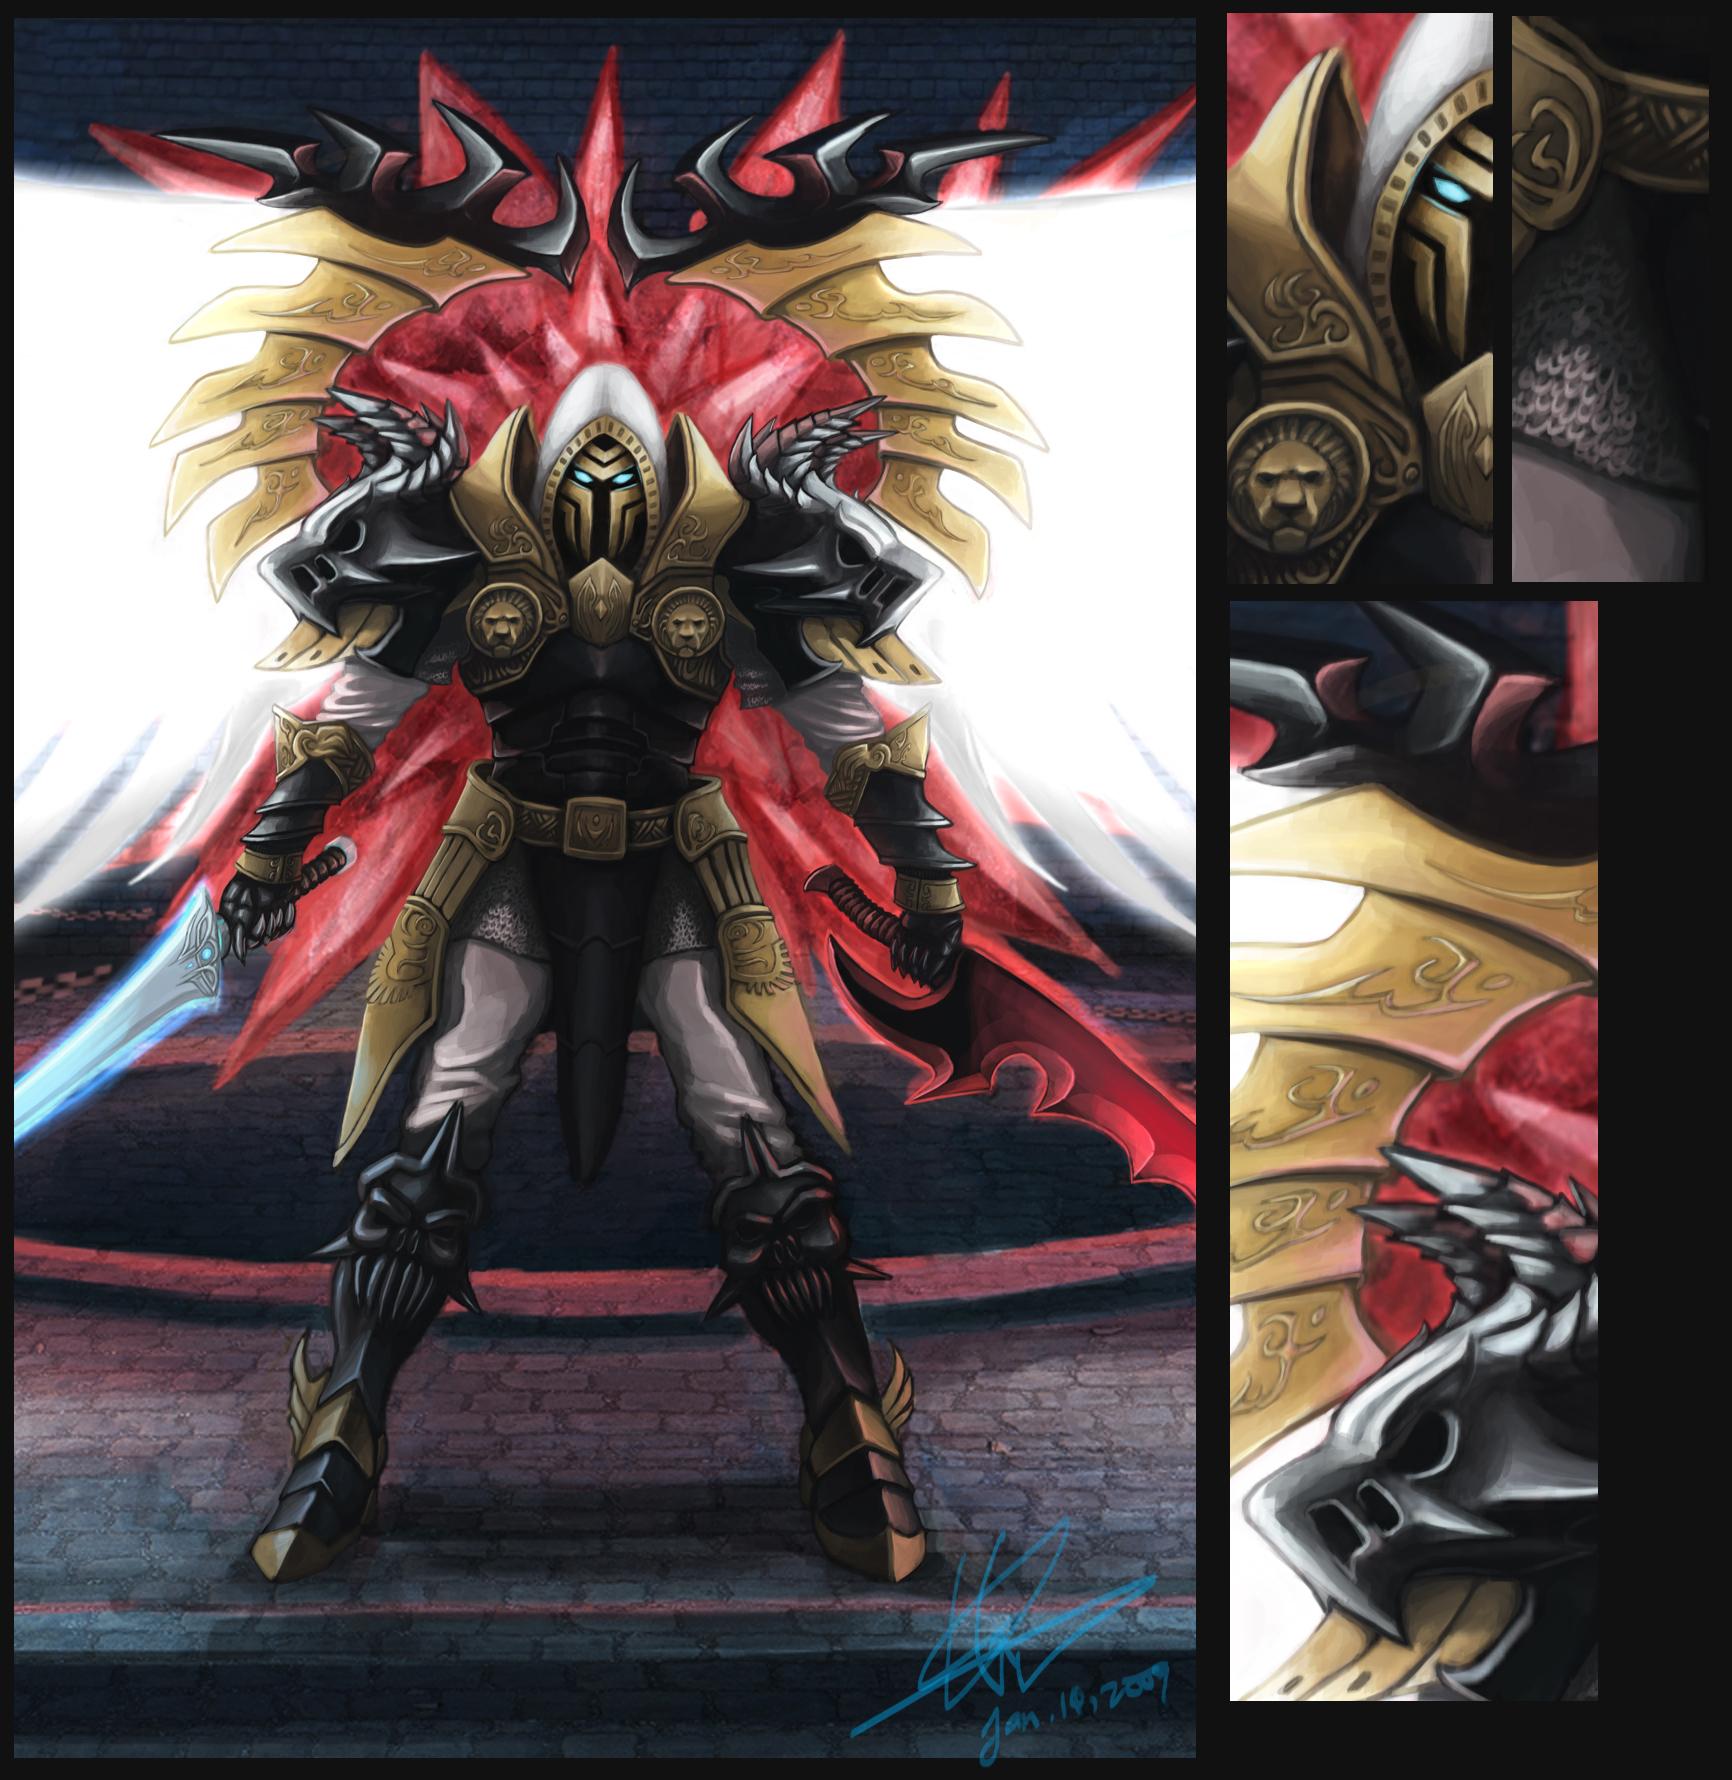 Avatar of Judgement - Revamped by shanku